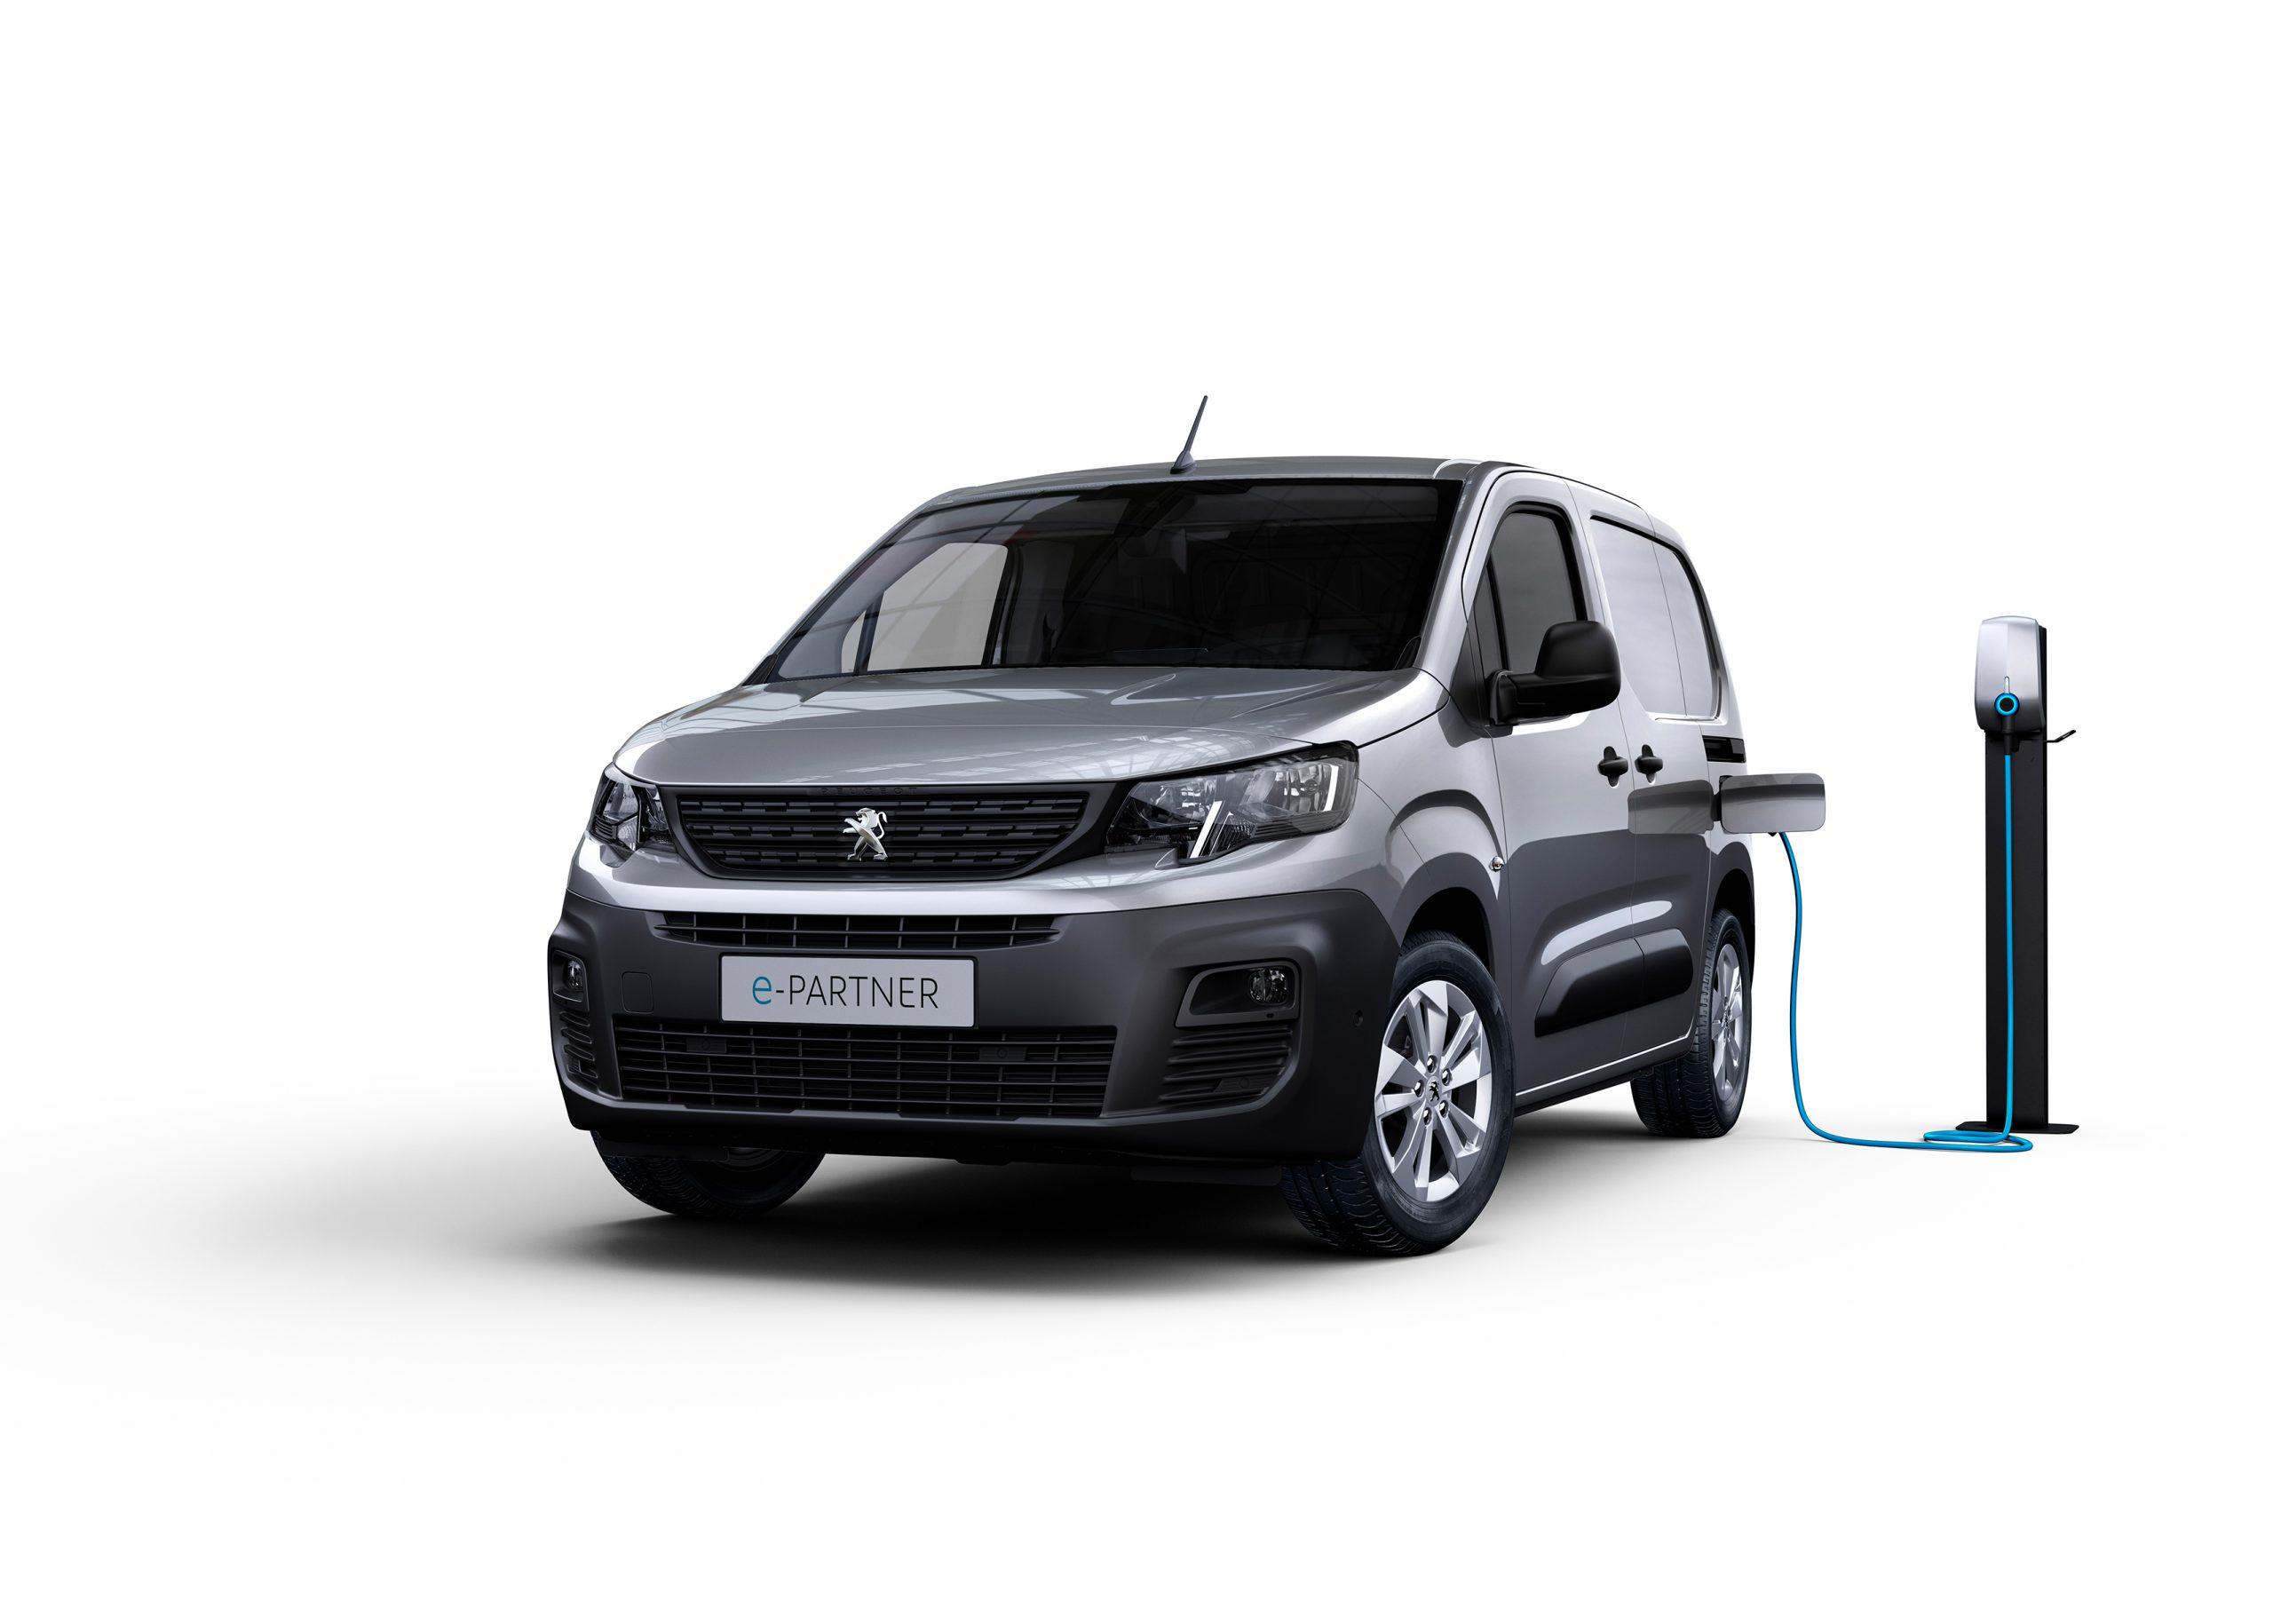 Peugeot bolsters electric van range with e-Partner